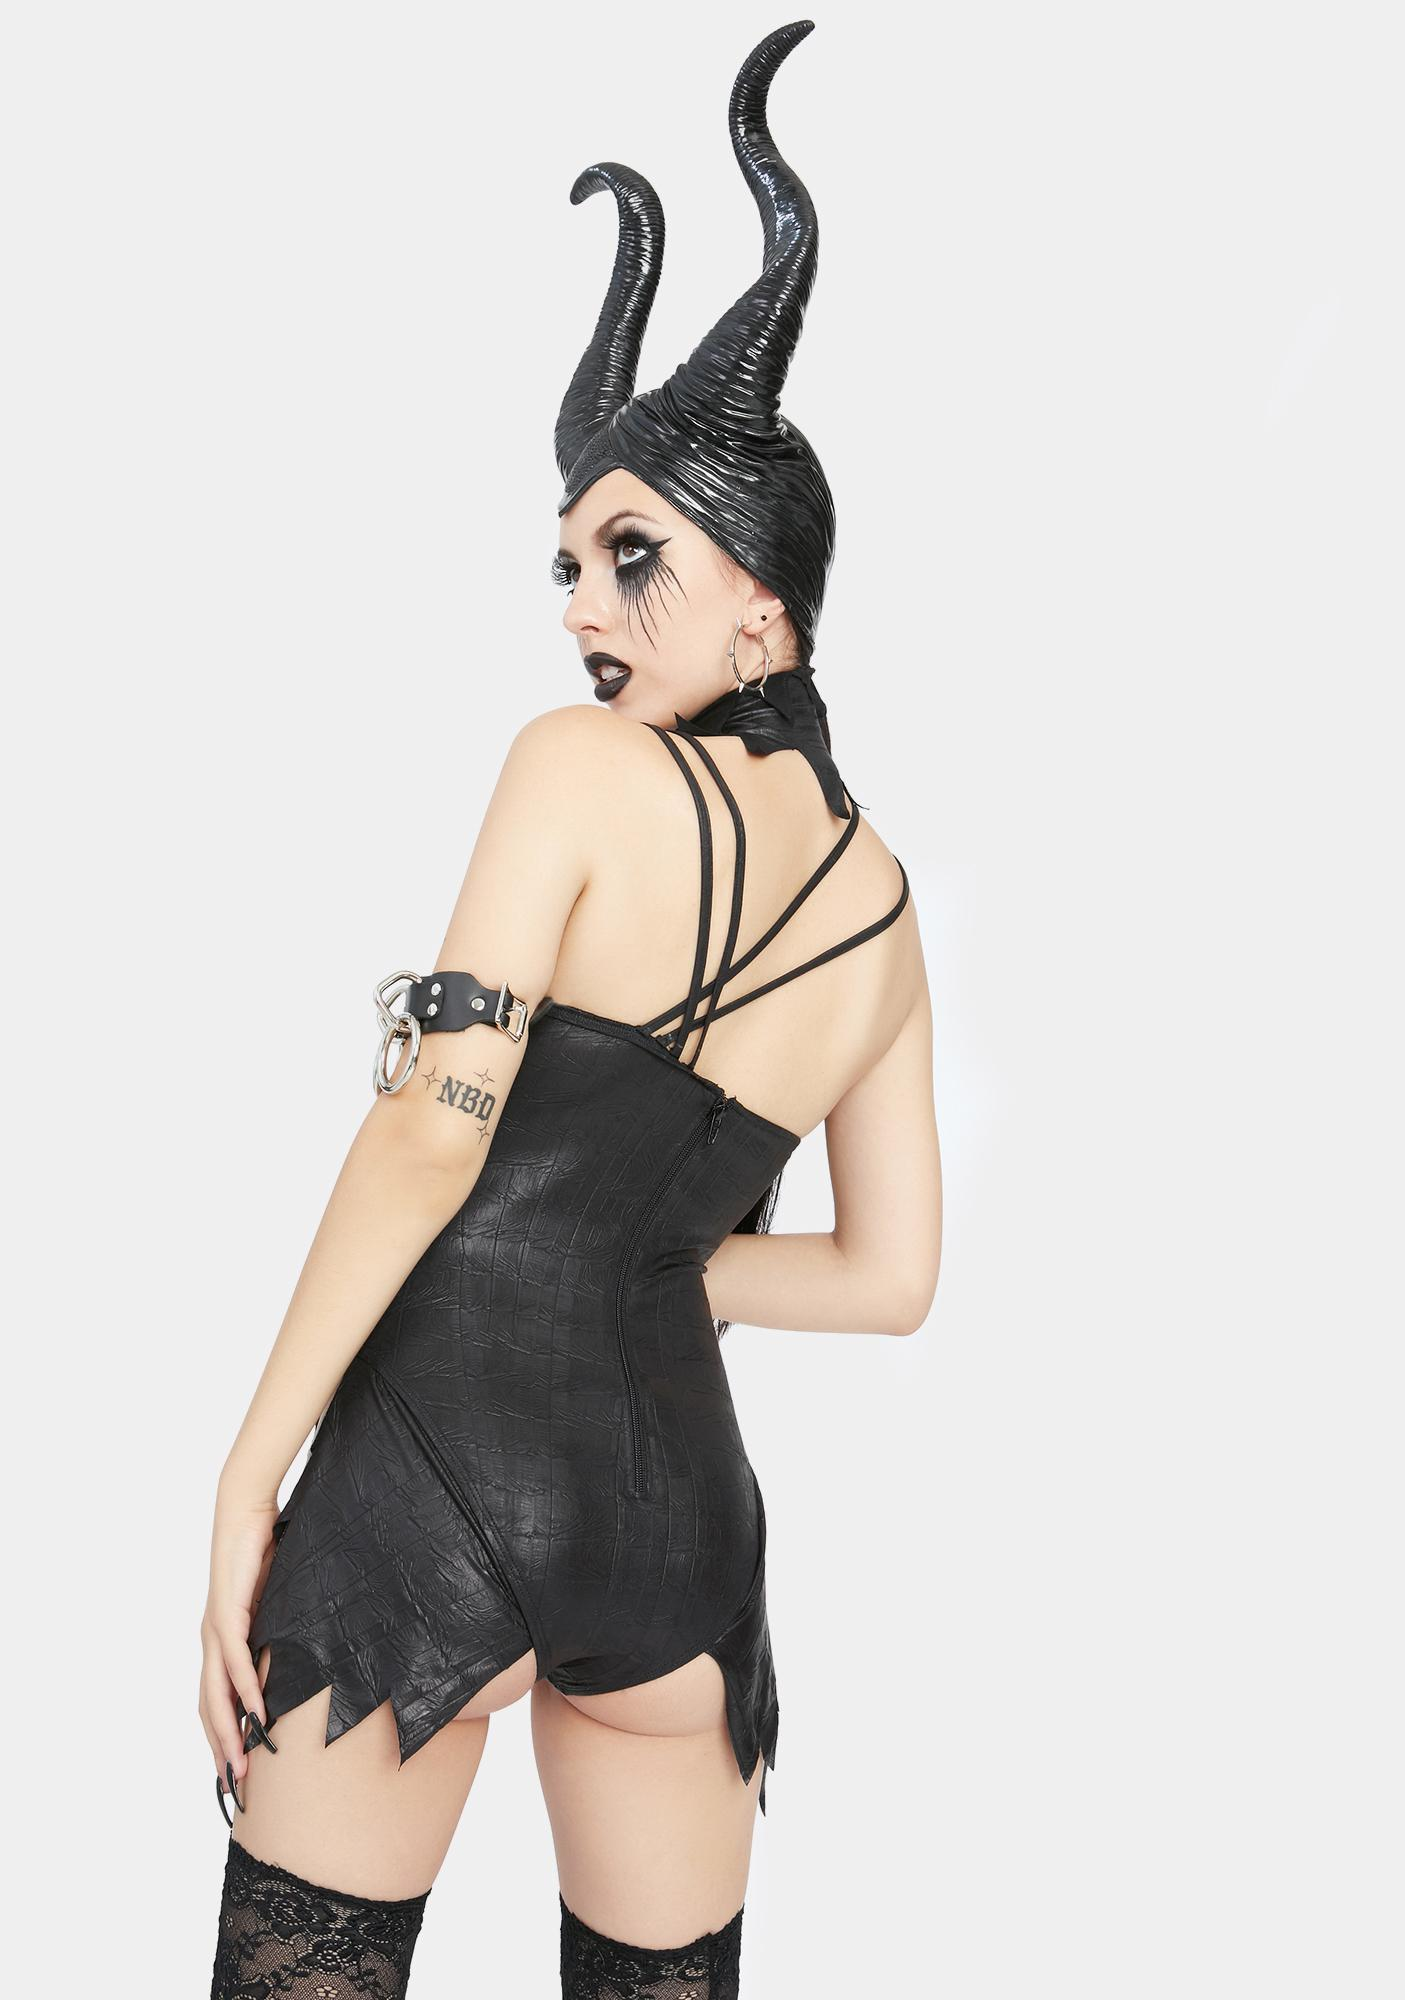 Forplay Beasty Sexy Movie Villain Costume